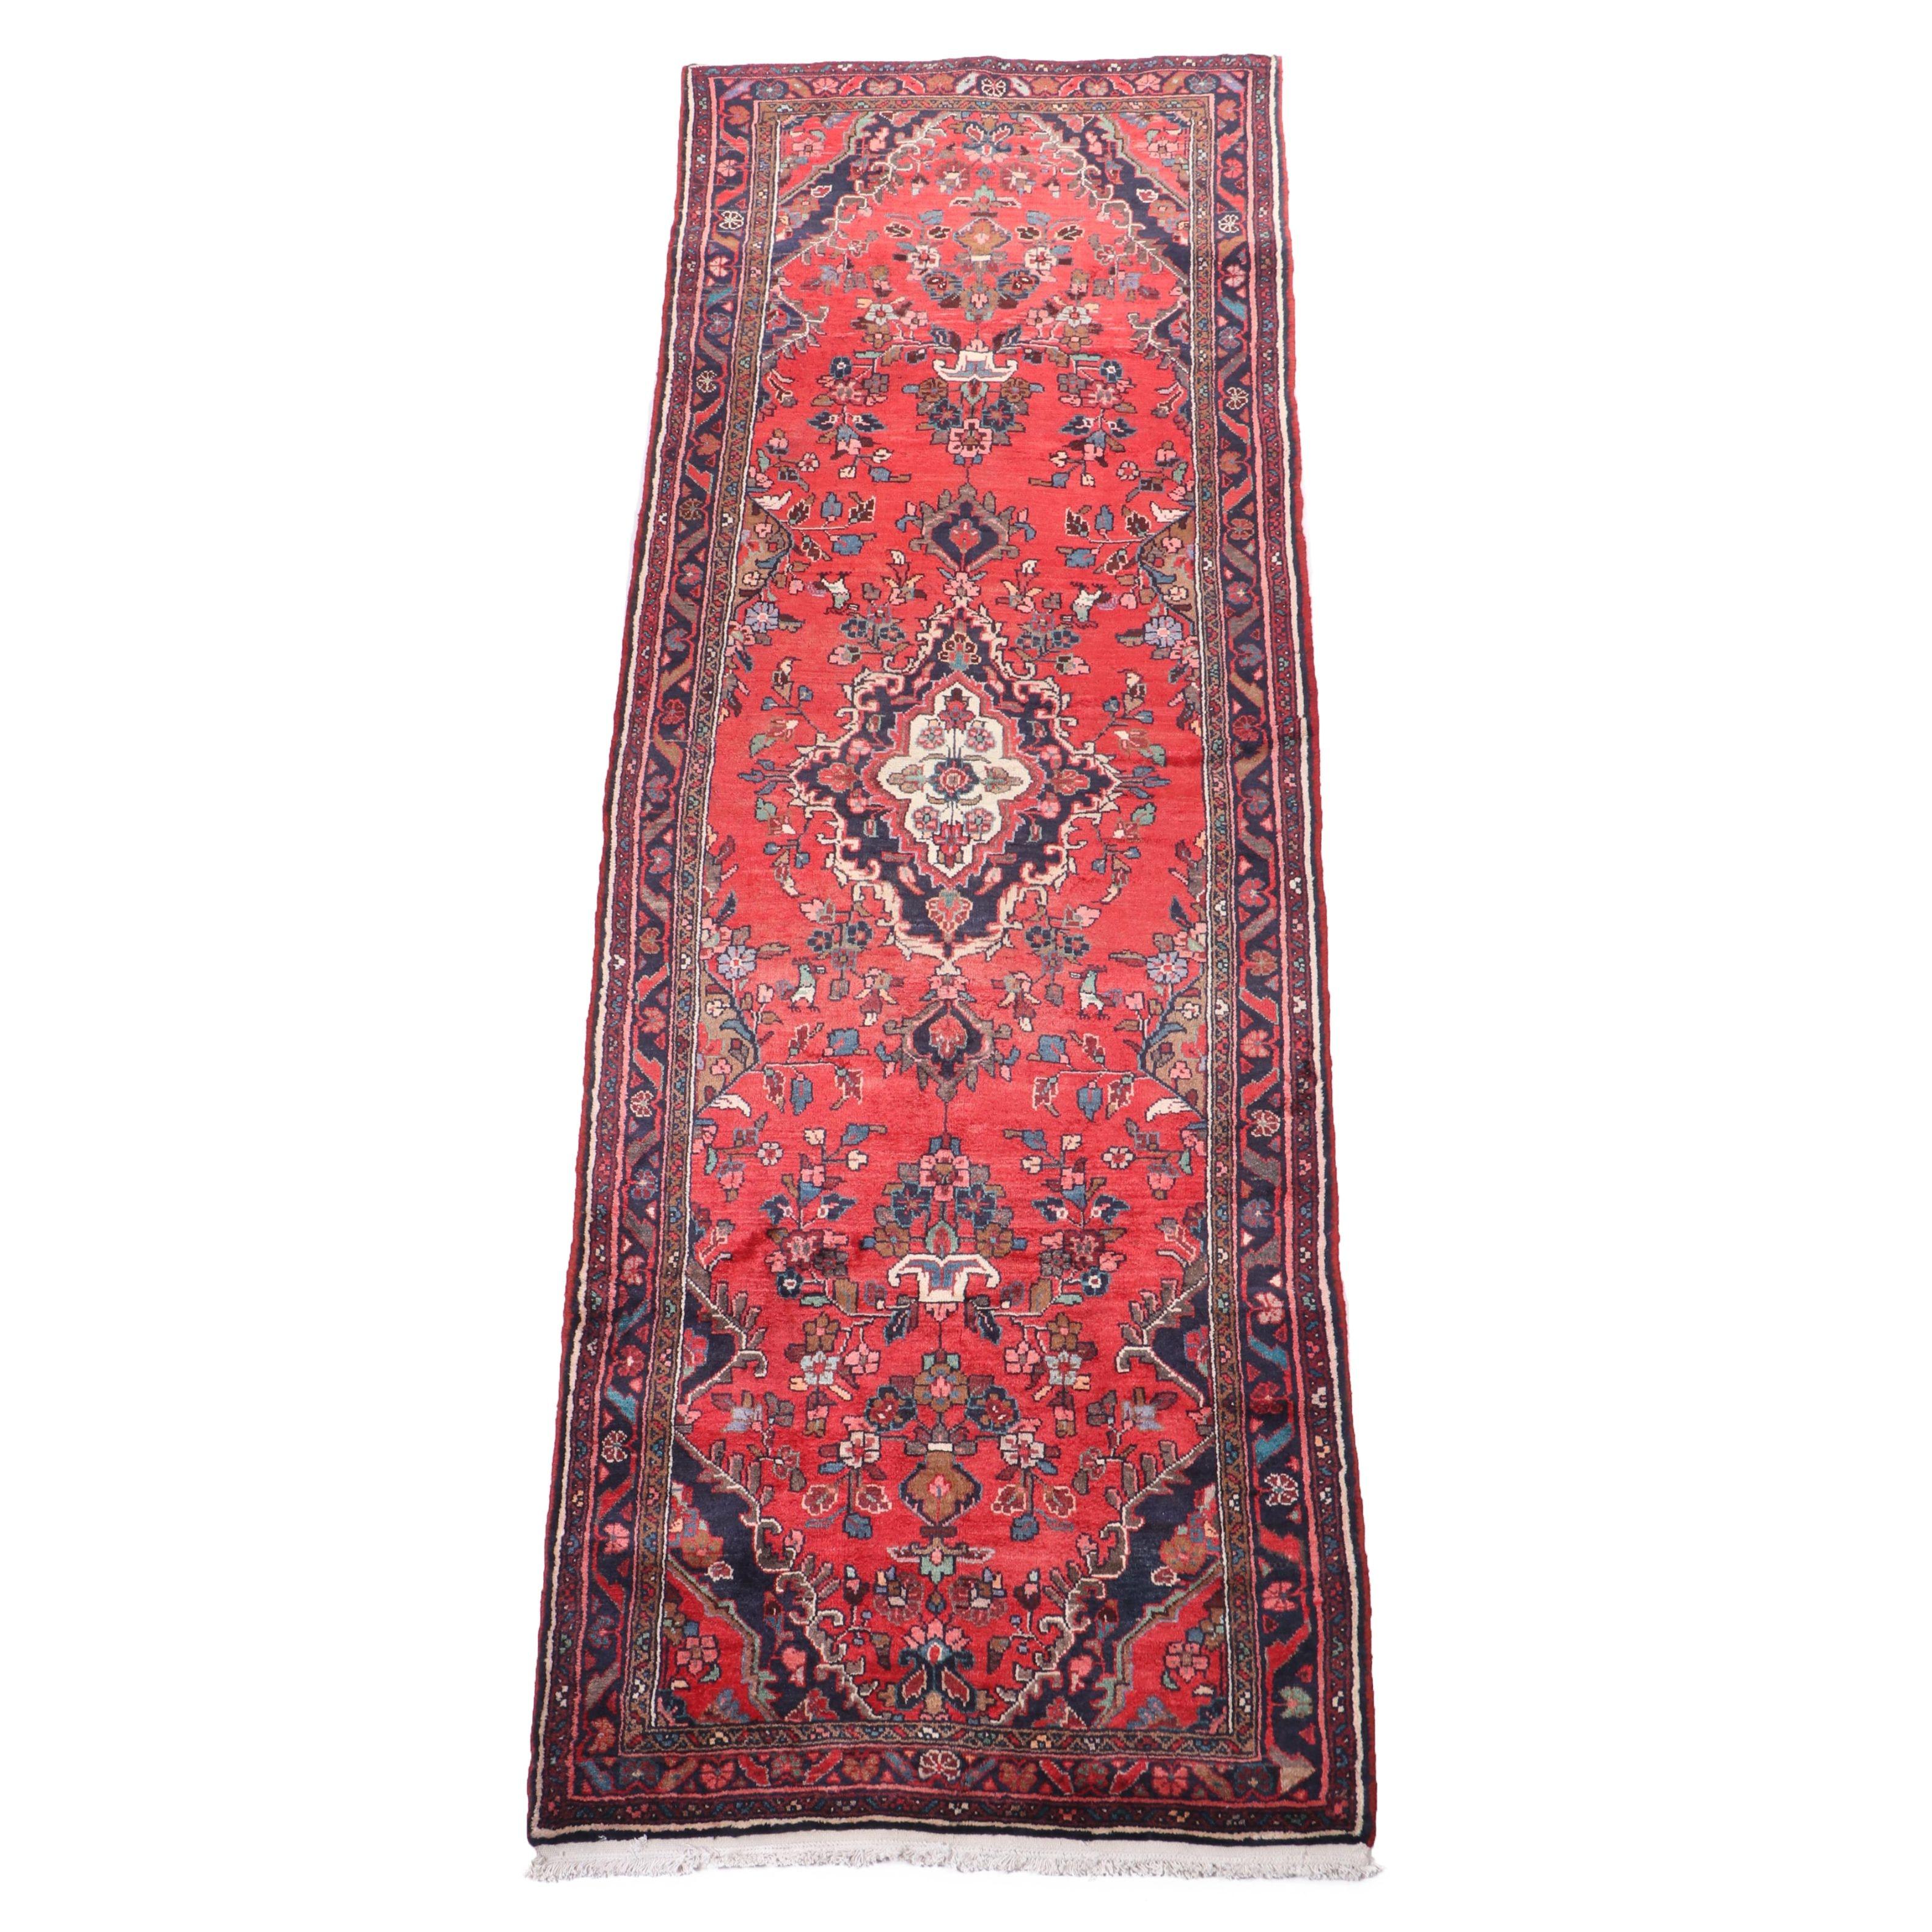 Hand-Knotted Persian Darjezine Wool Carpet Runner